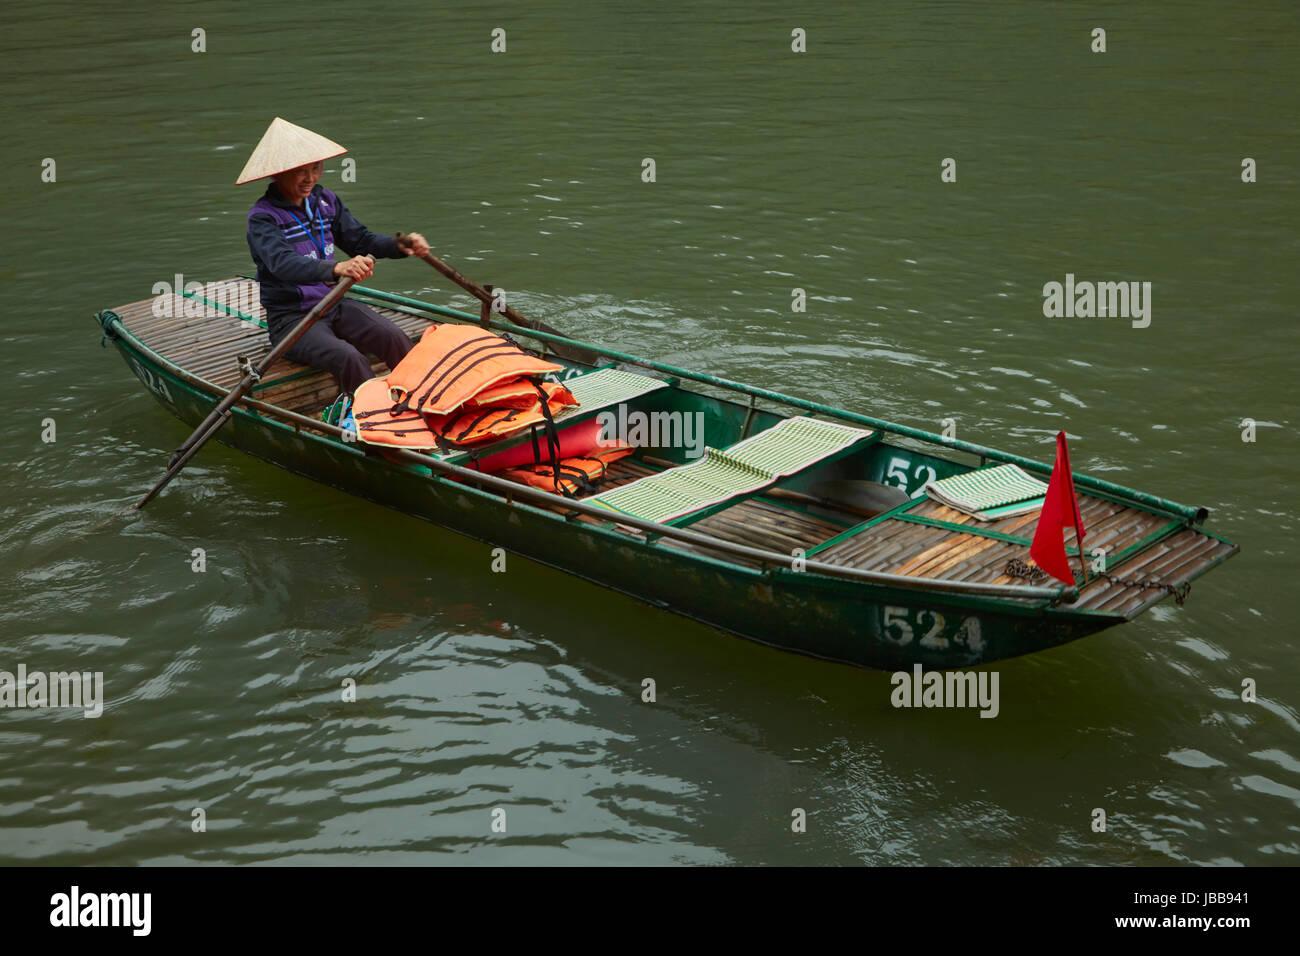 Woman in tourist boat for Trang An Grottoes trip (UNESCO World Heritage Area), near Ninh Binh, Vietnam - Stock Image